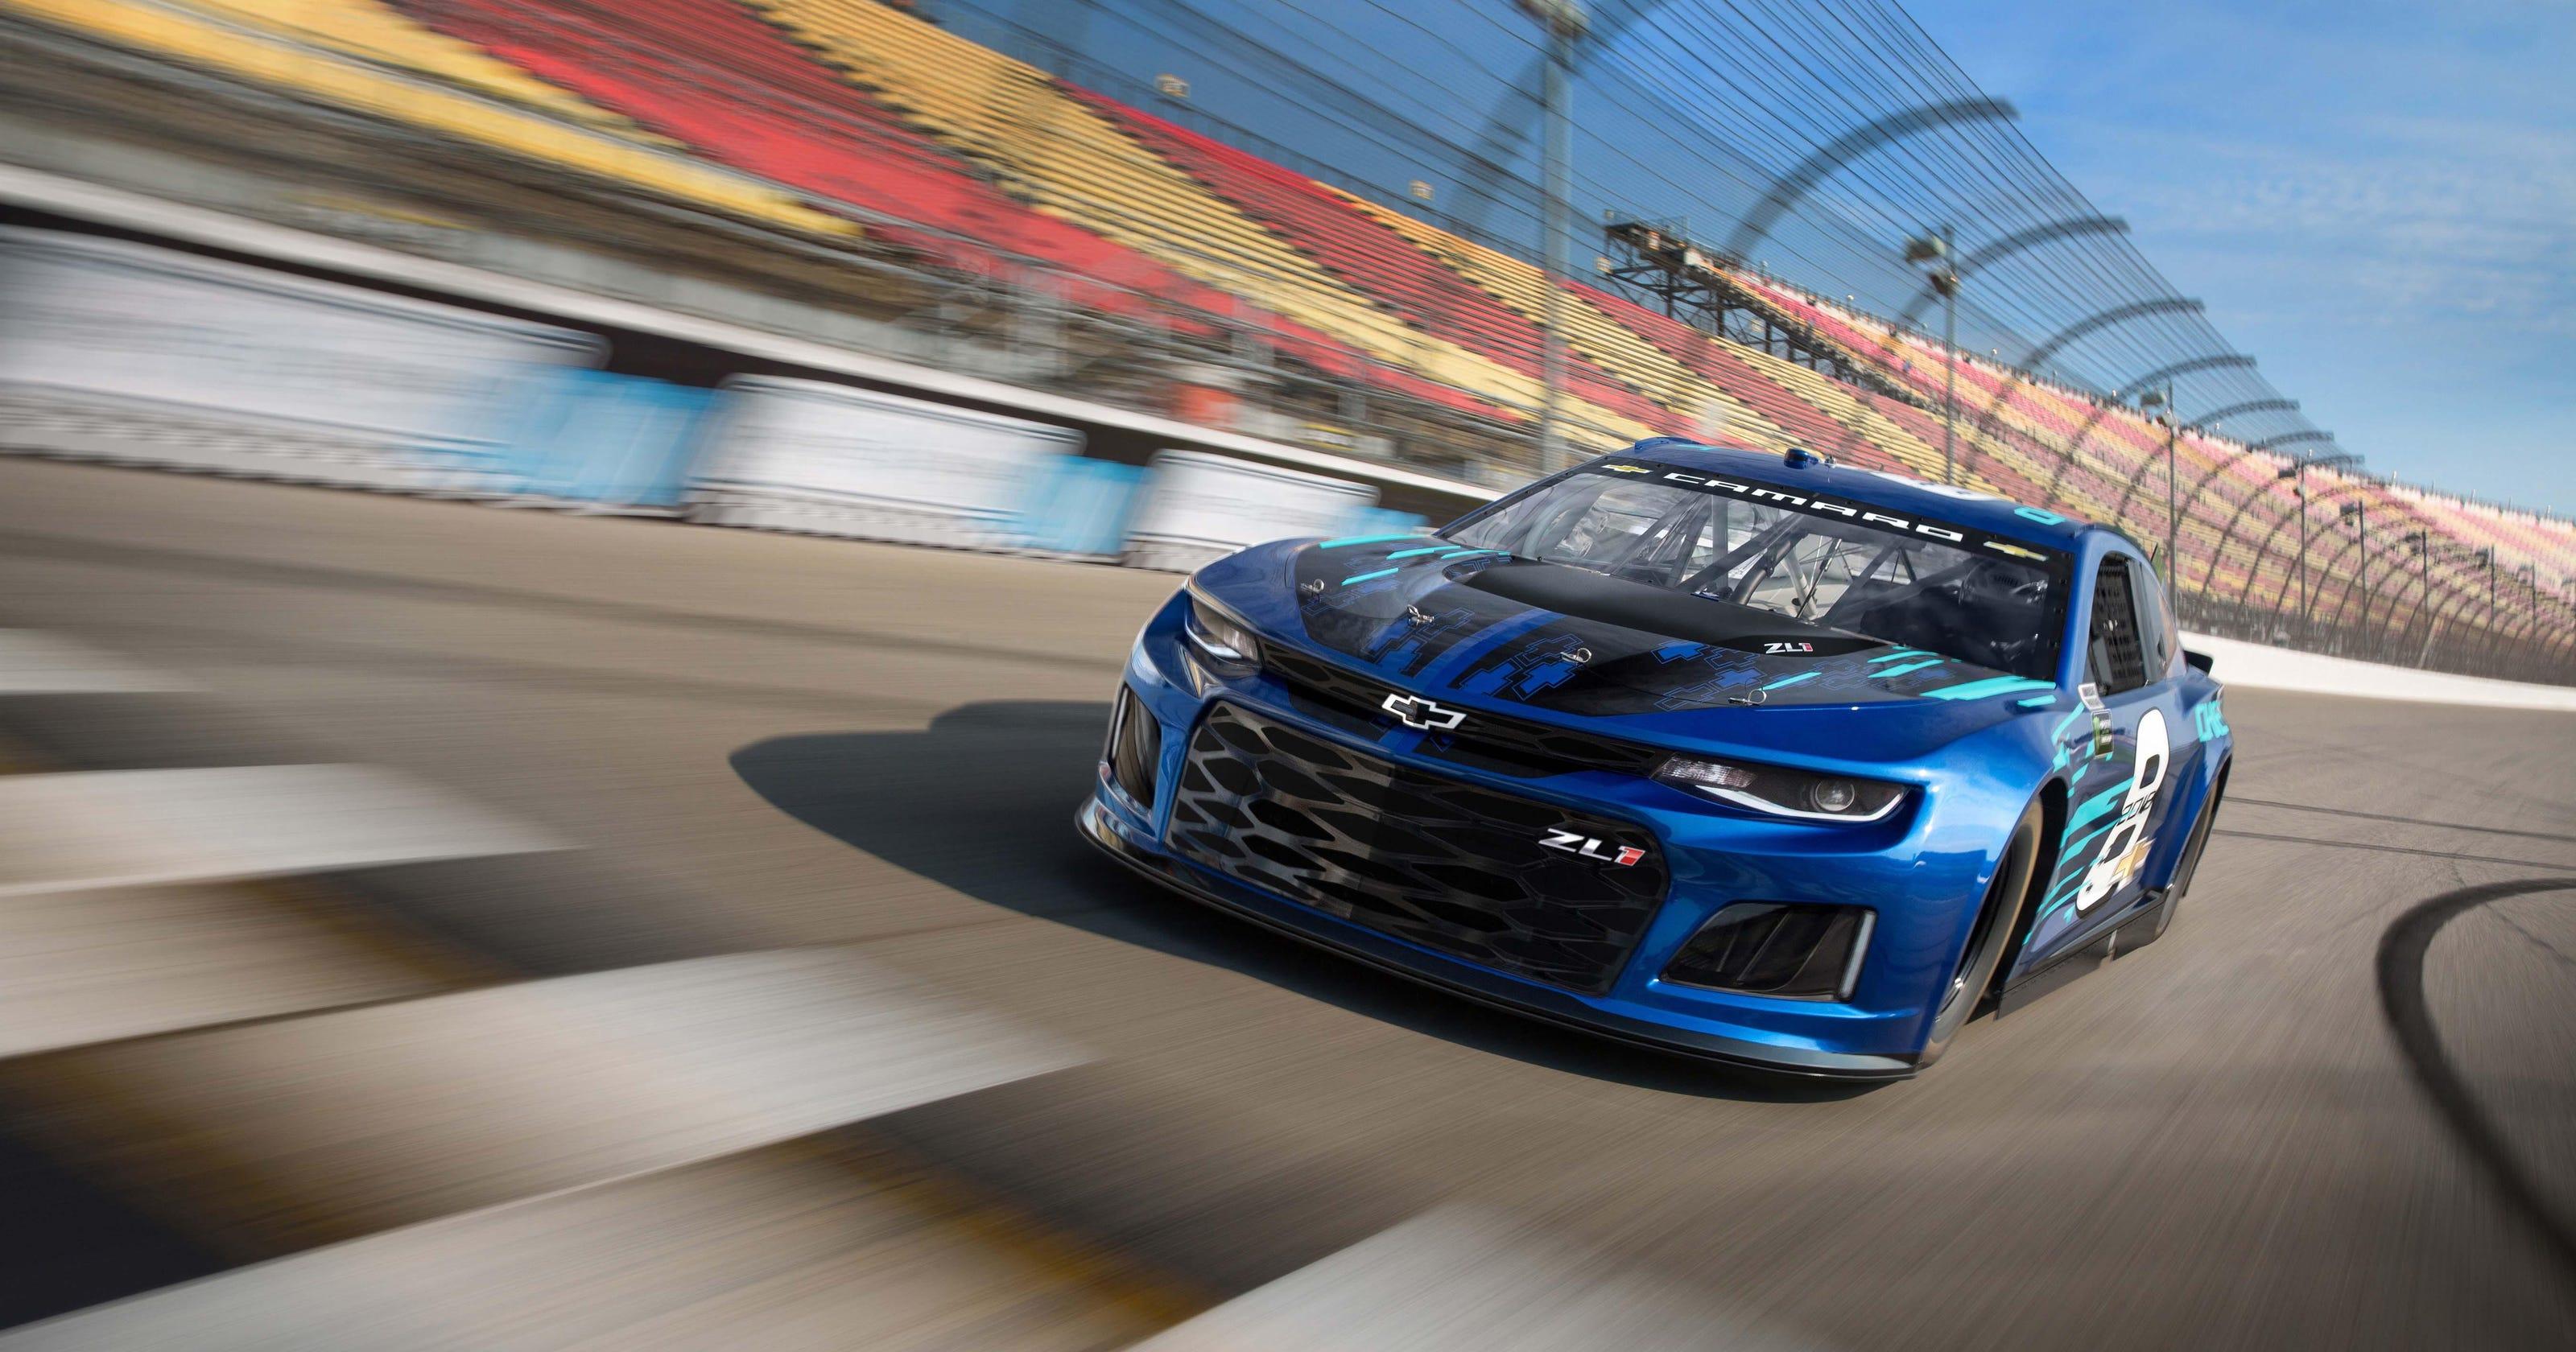 Camaro ZL1 crashes the sedan party at Daytona 500